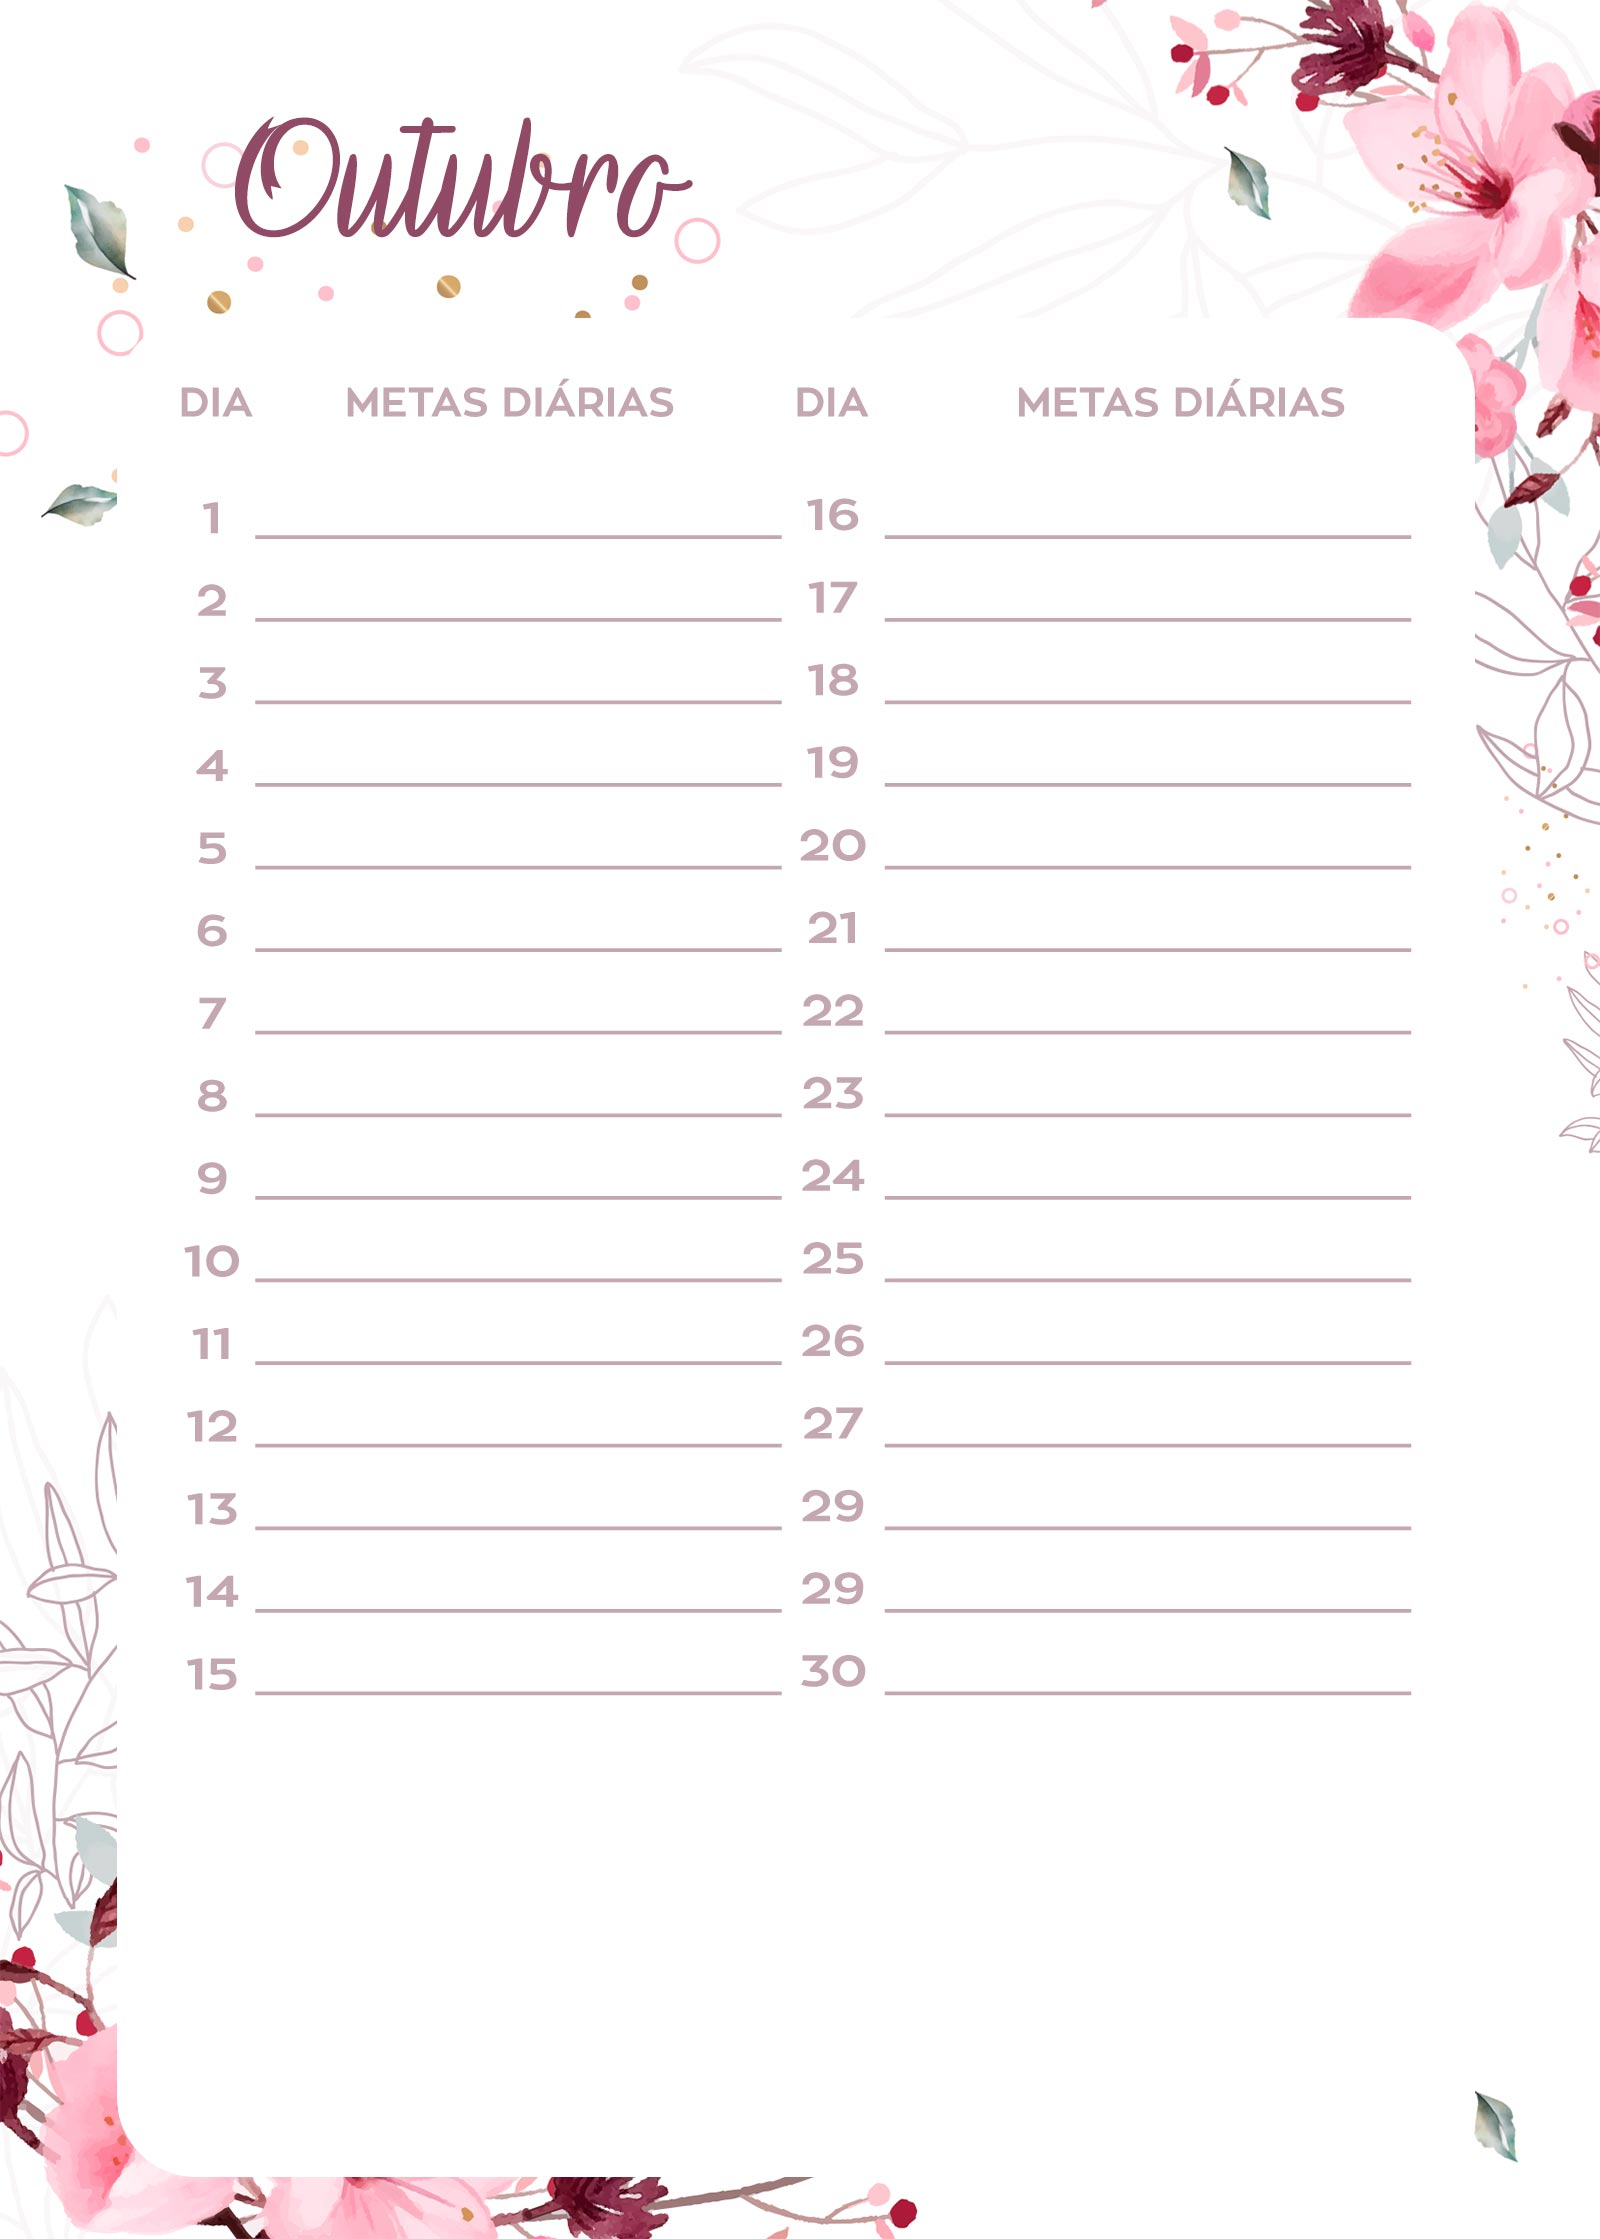 Planner Floral metas diarias out